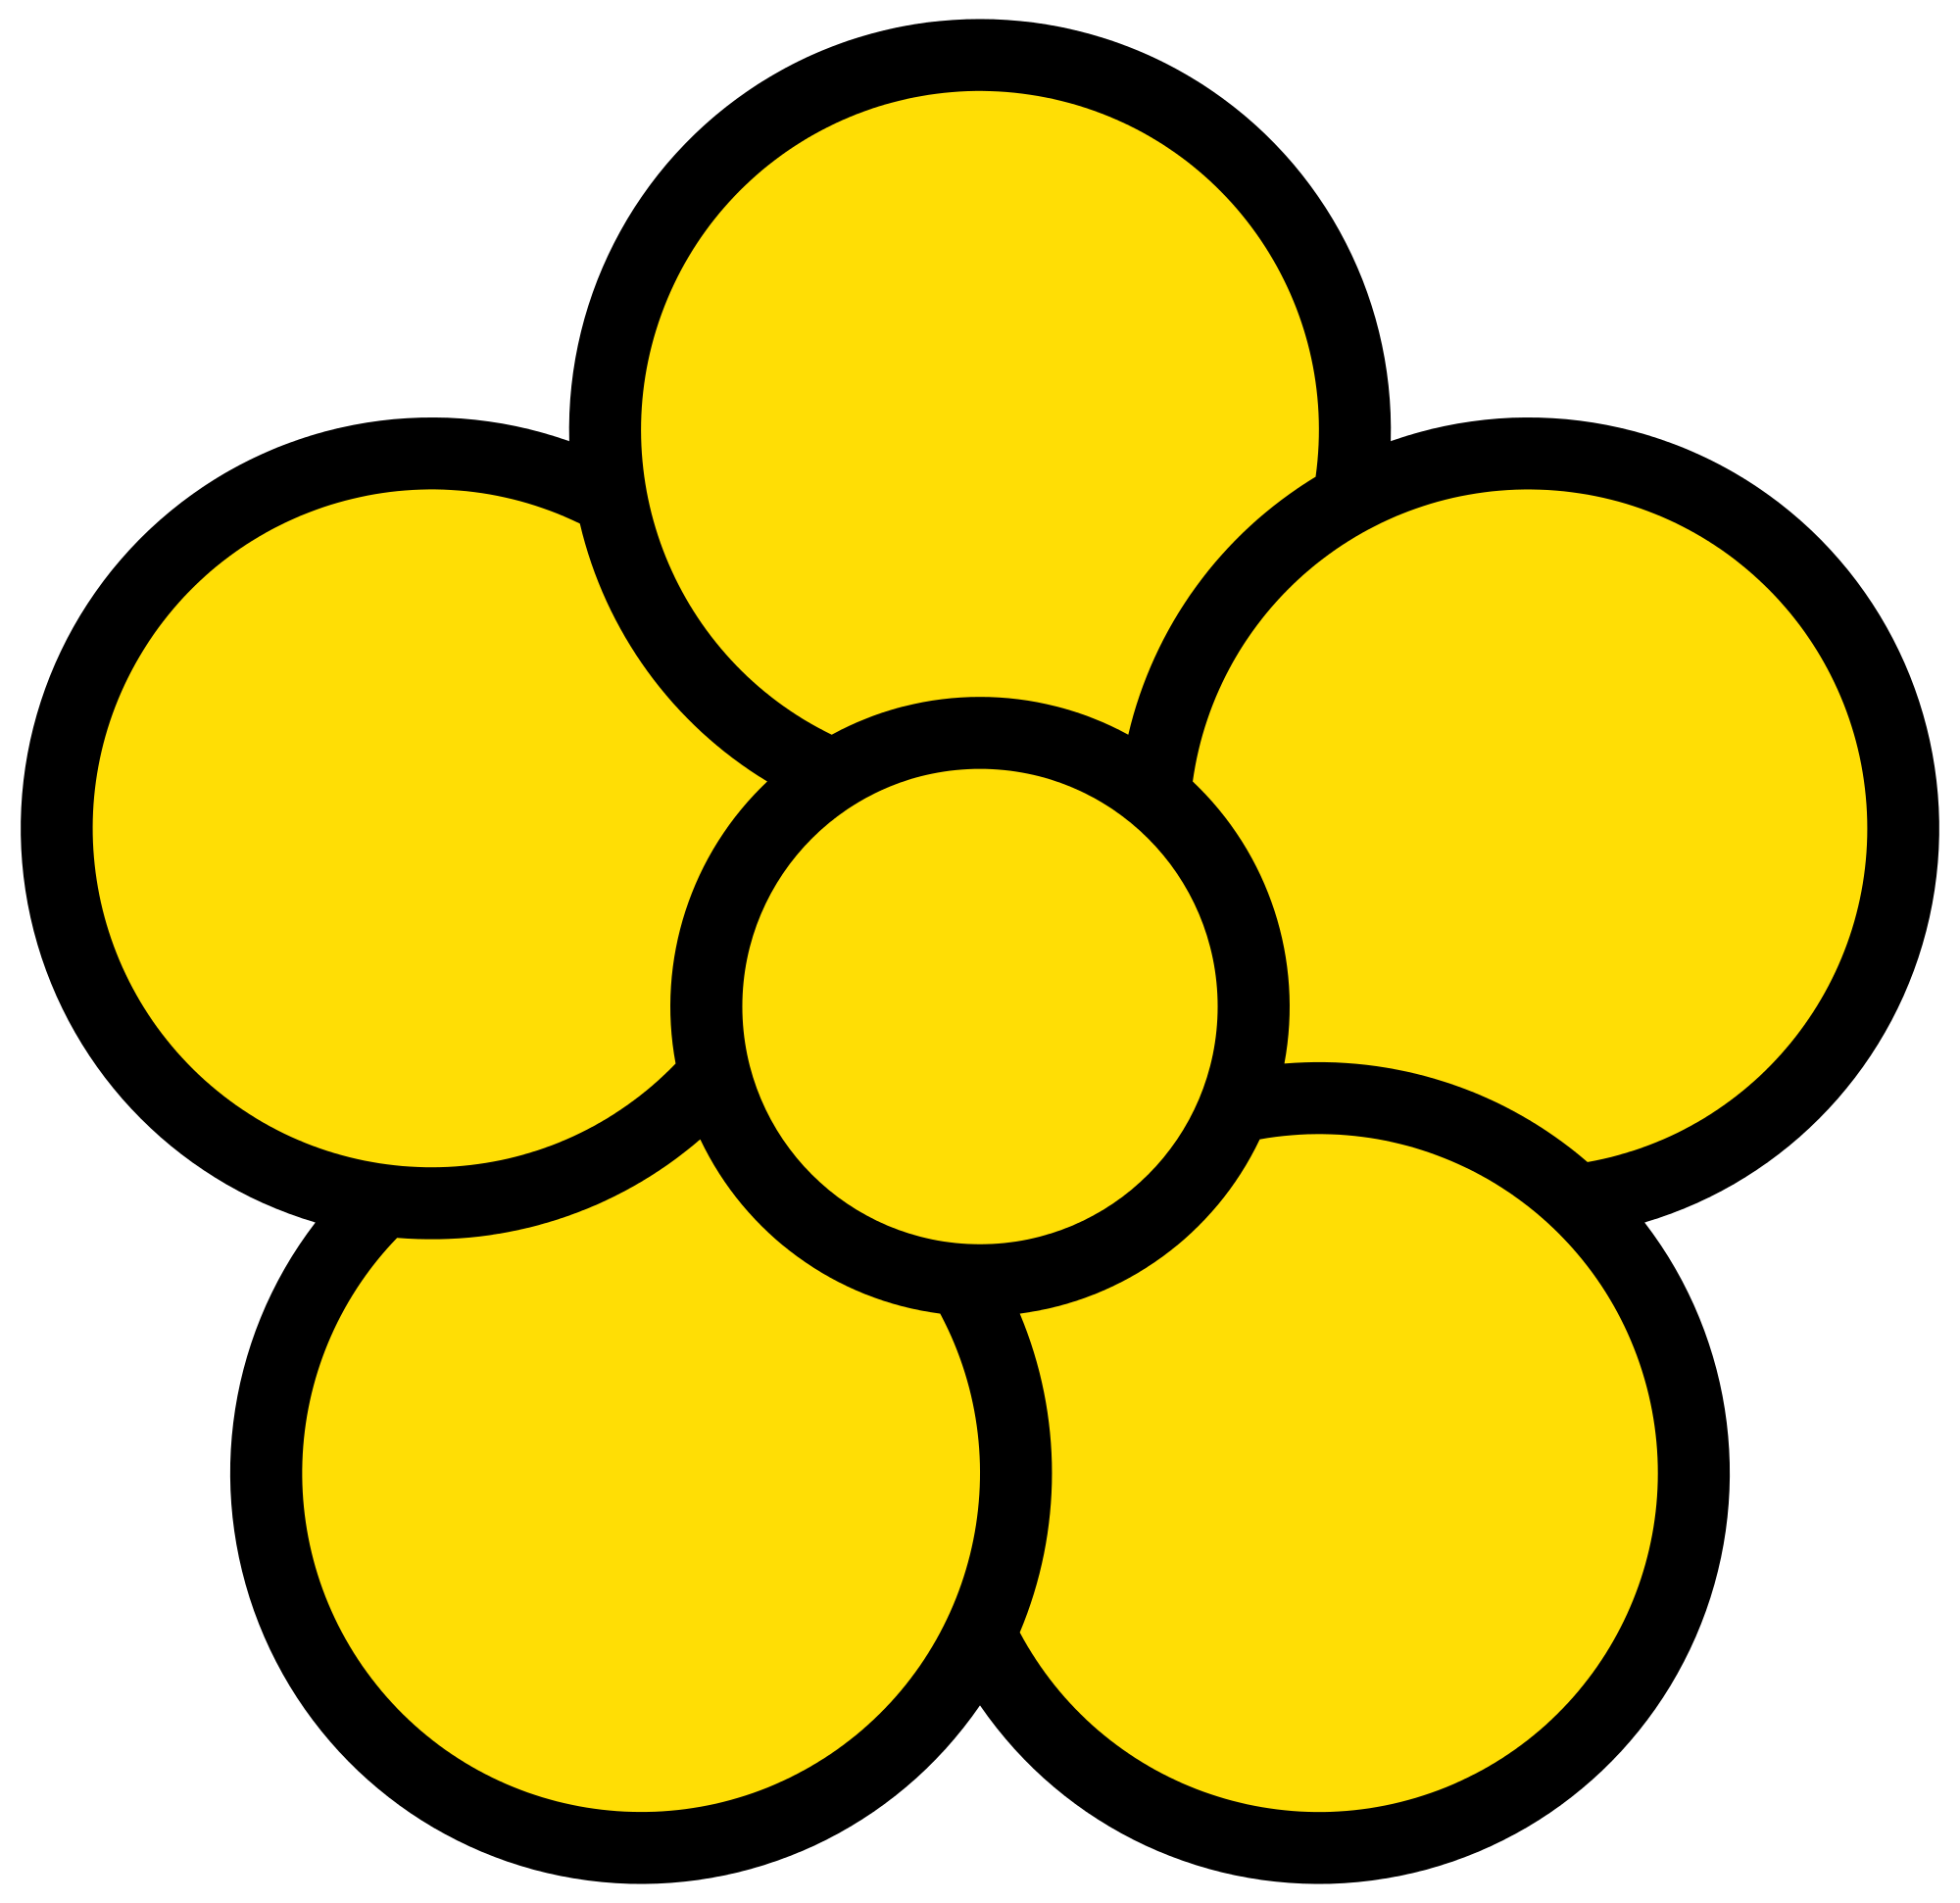 5 Petal Flower Drawing at GetDrawings | Free download